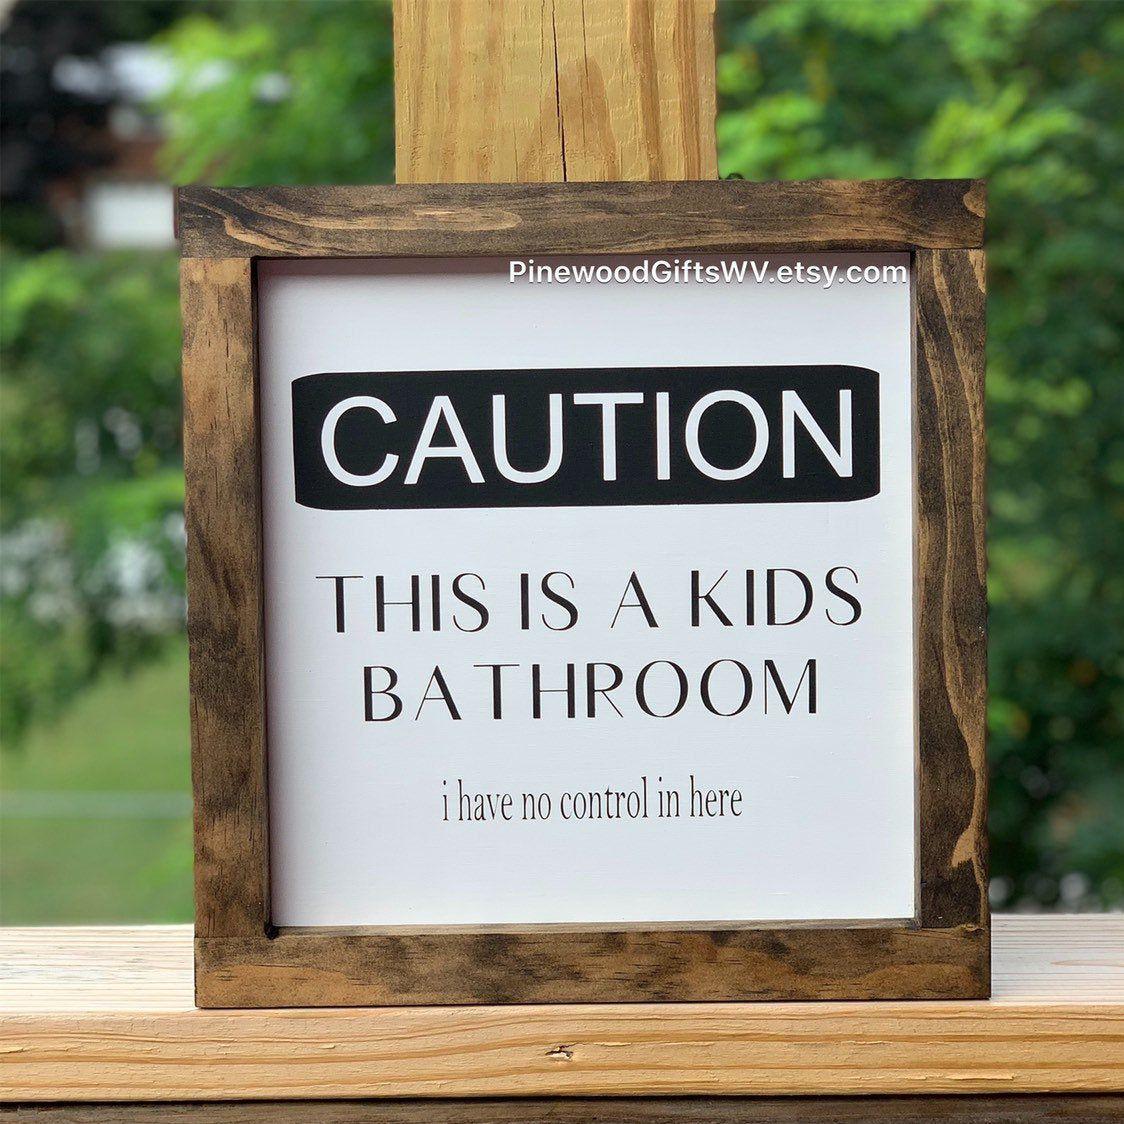 Caution kids bathroom i have no control farmh ouse sign